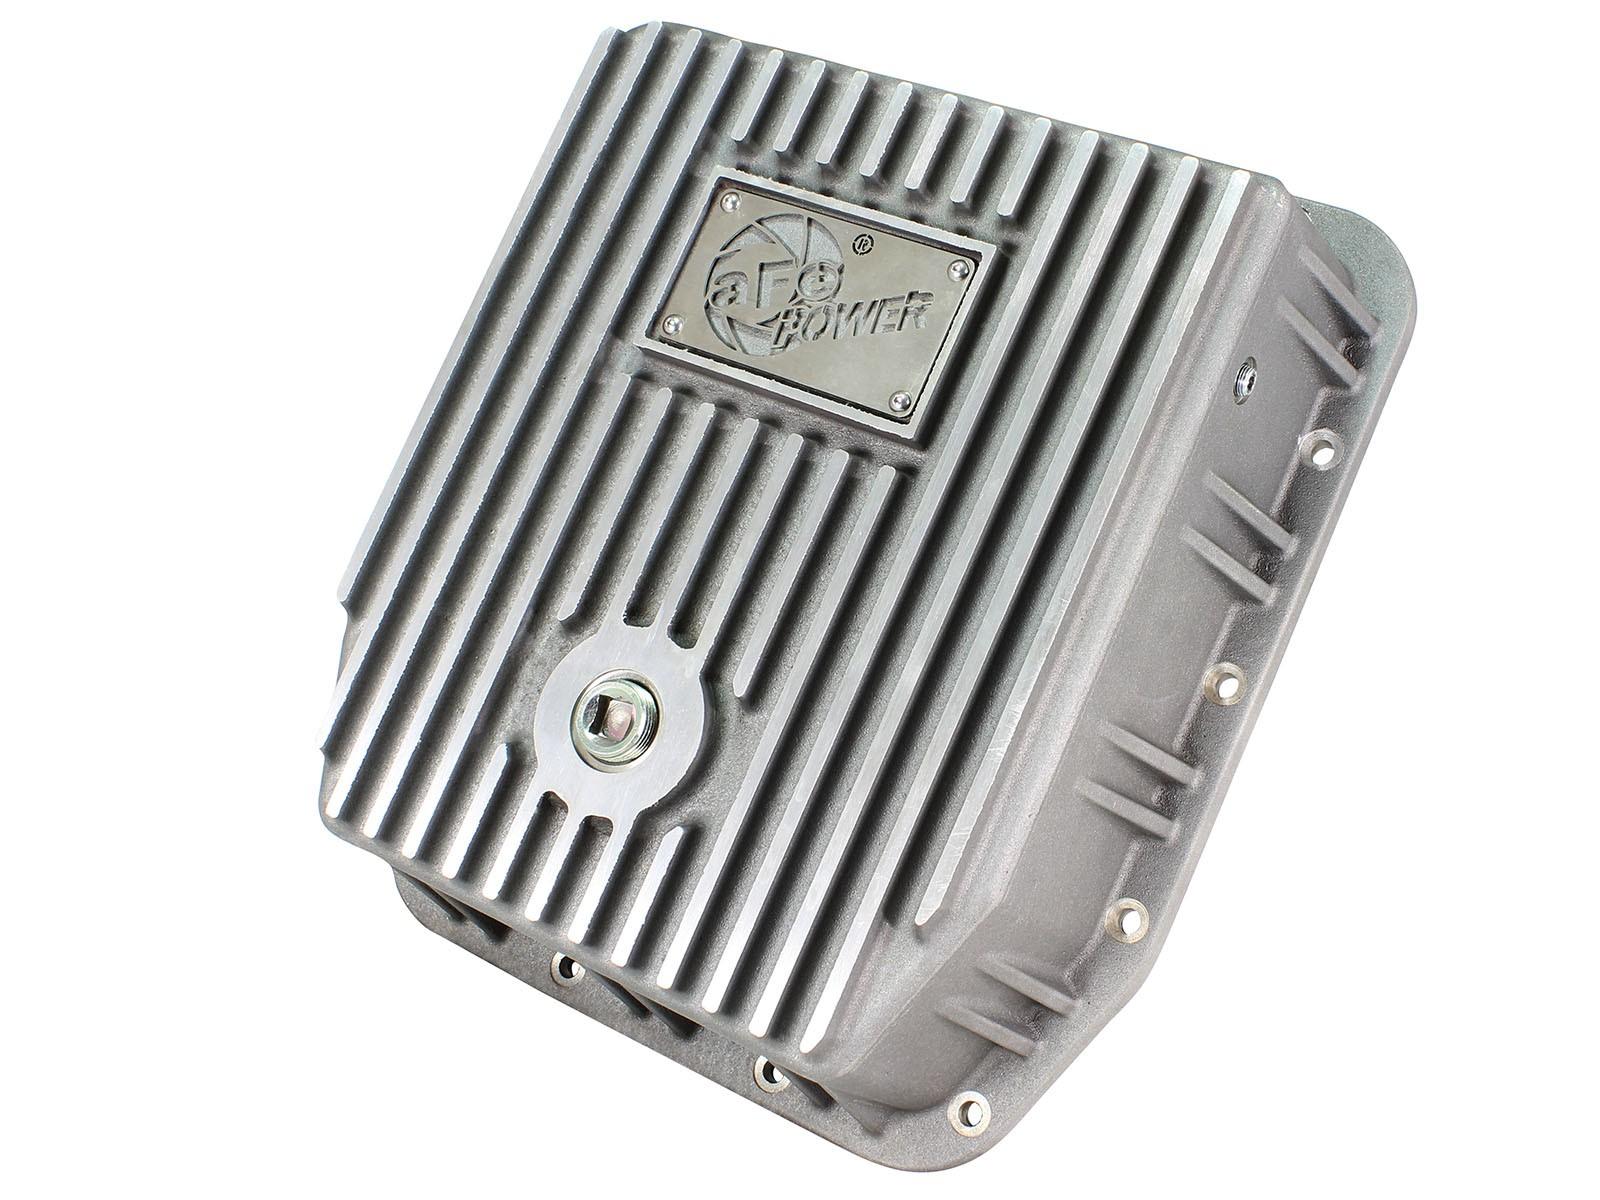 aFe POWER 46-70220 Transmission Pan, Machined Fins